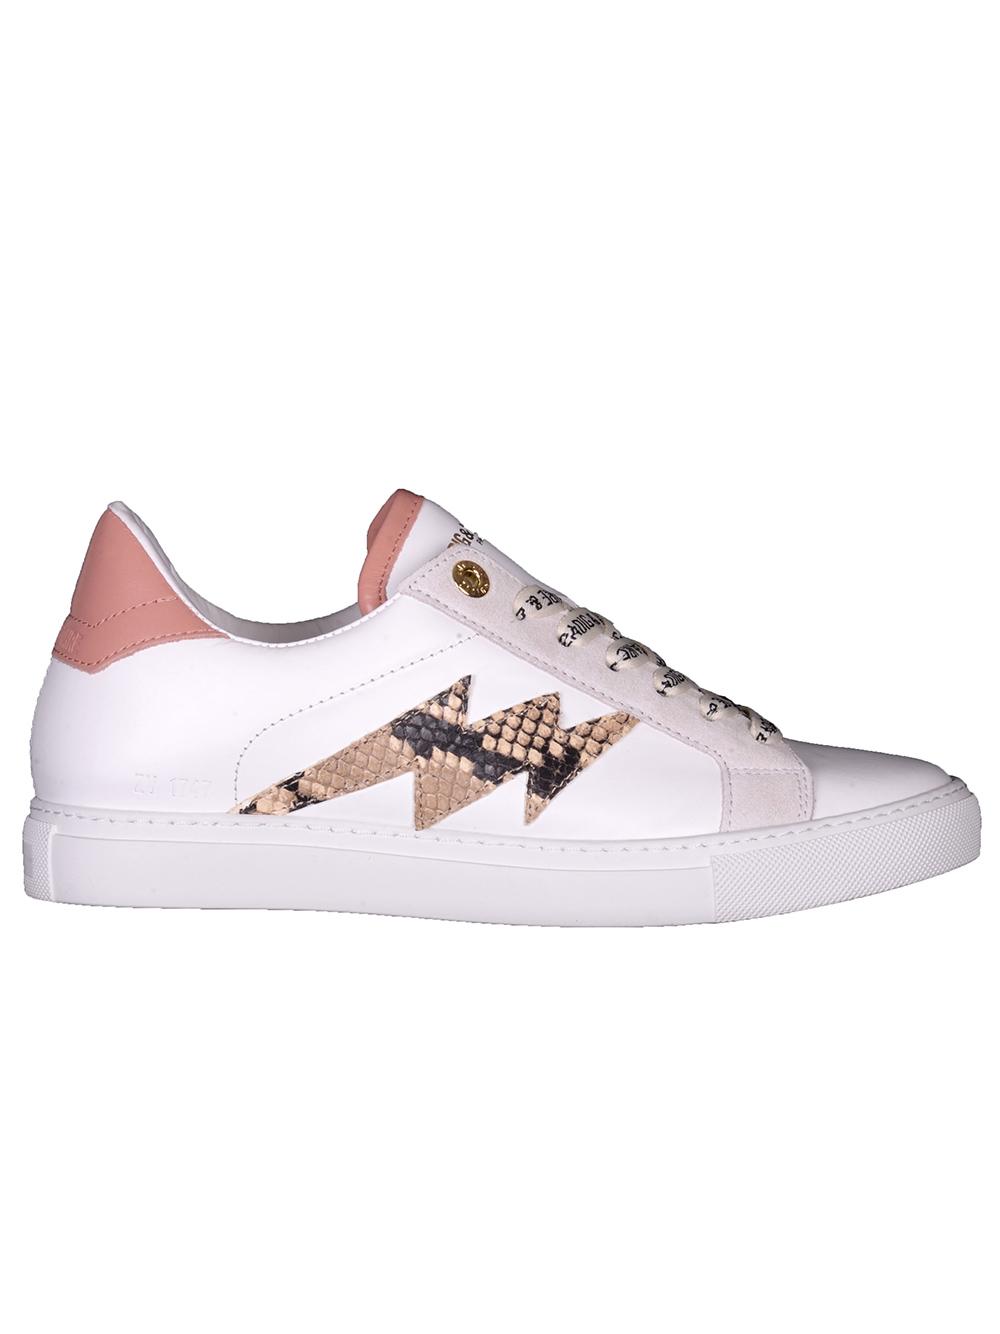 ZADIG & VOLTAIRE Παπούτσια sneakers SKAM1706F ΛΕΥΚΟ